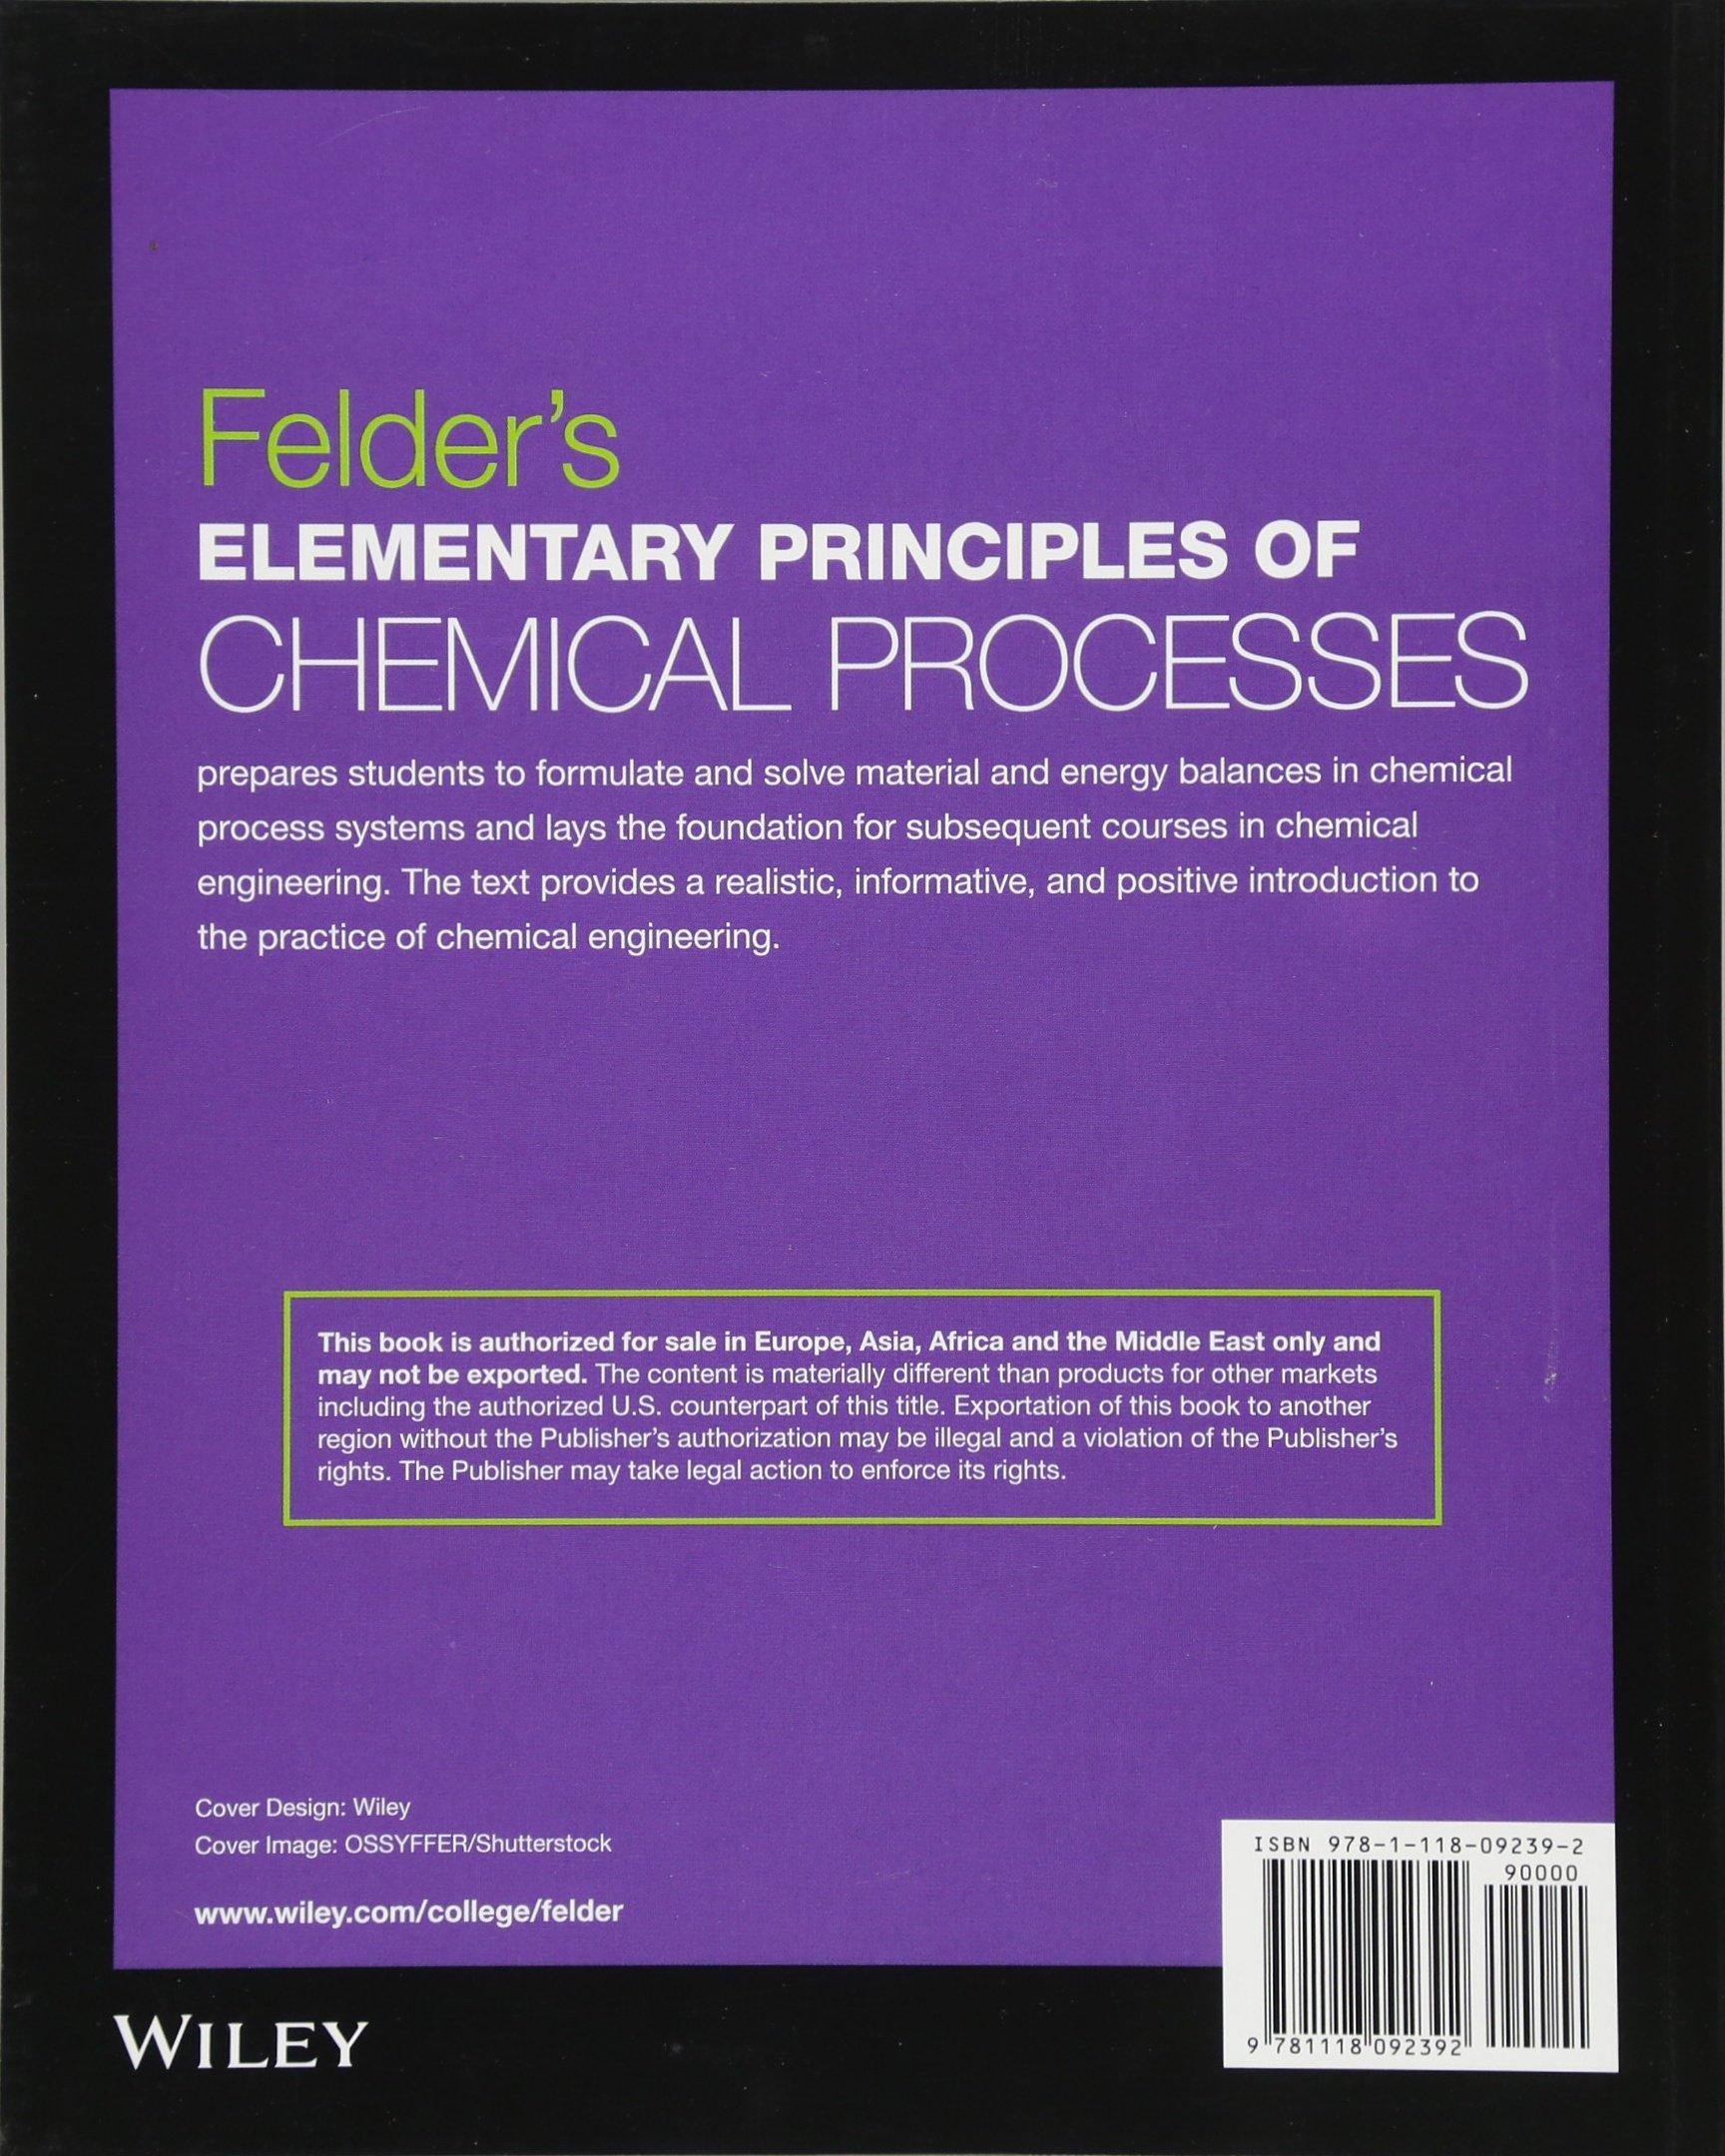 Buy Felder′s Elementary Principles of Chemical Processes